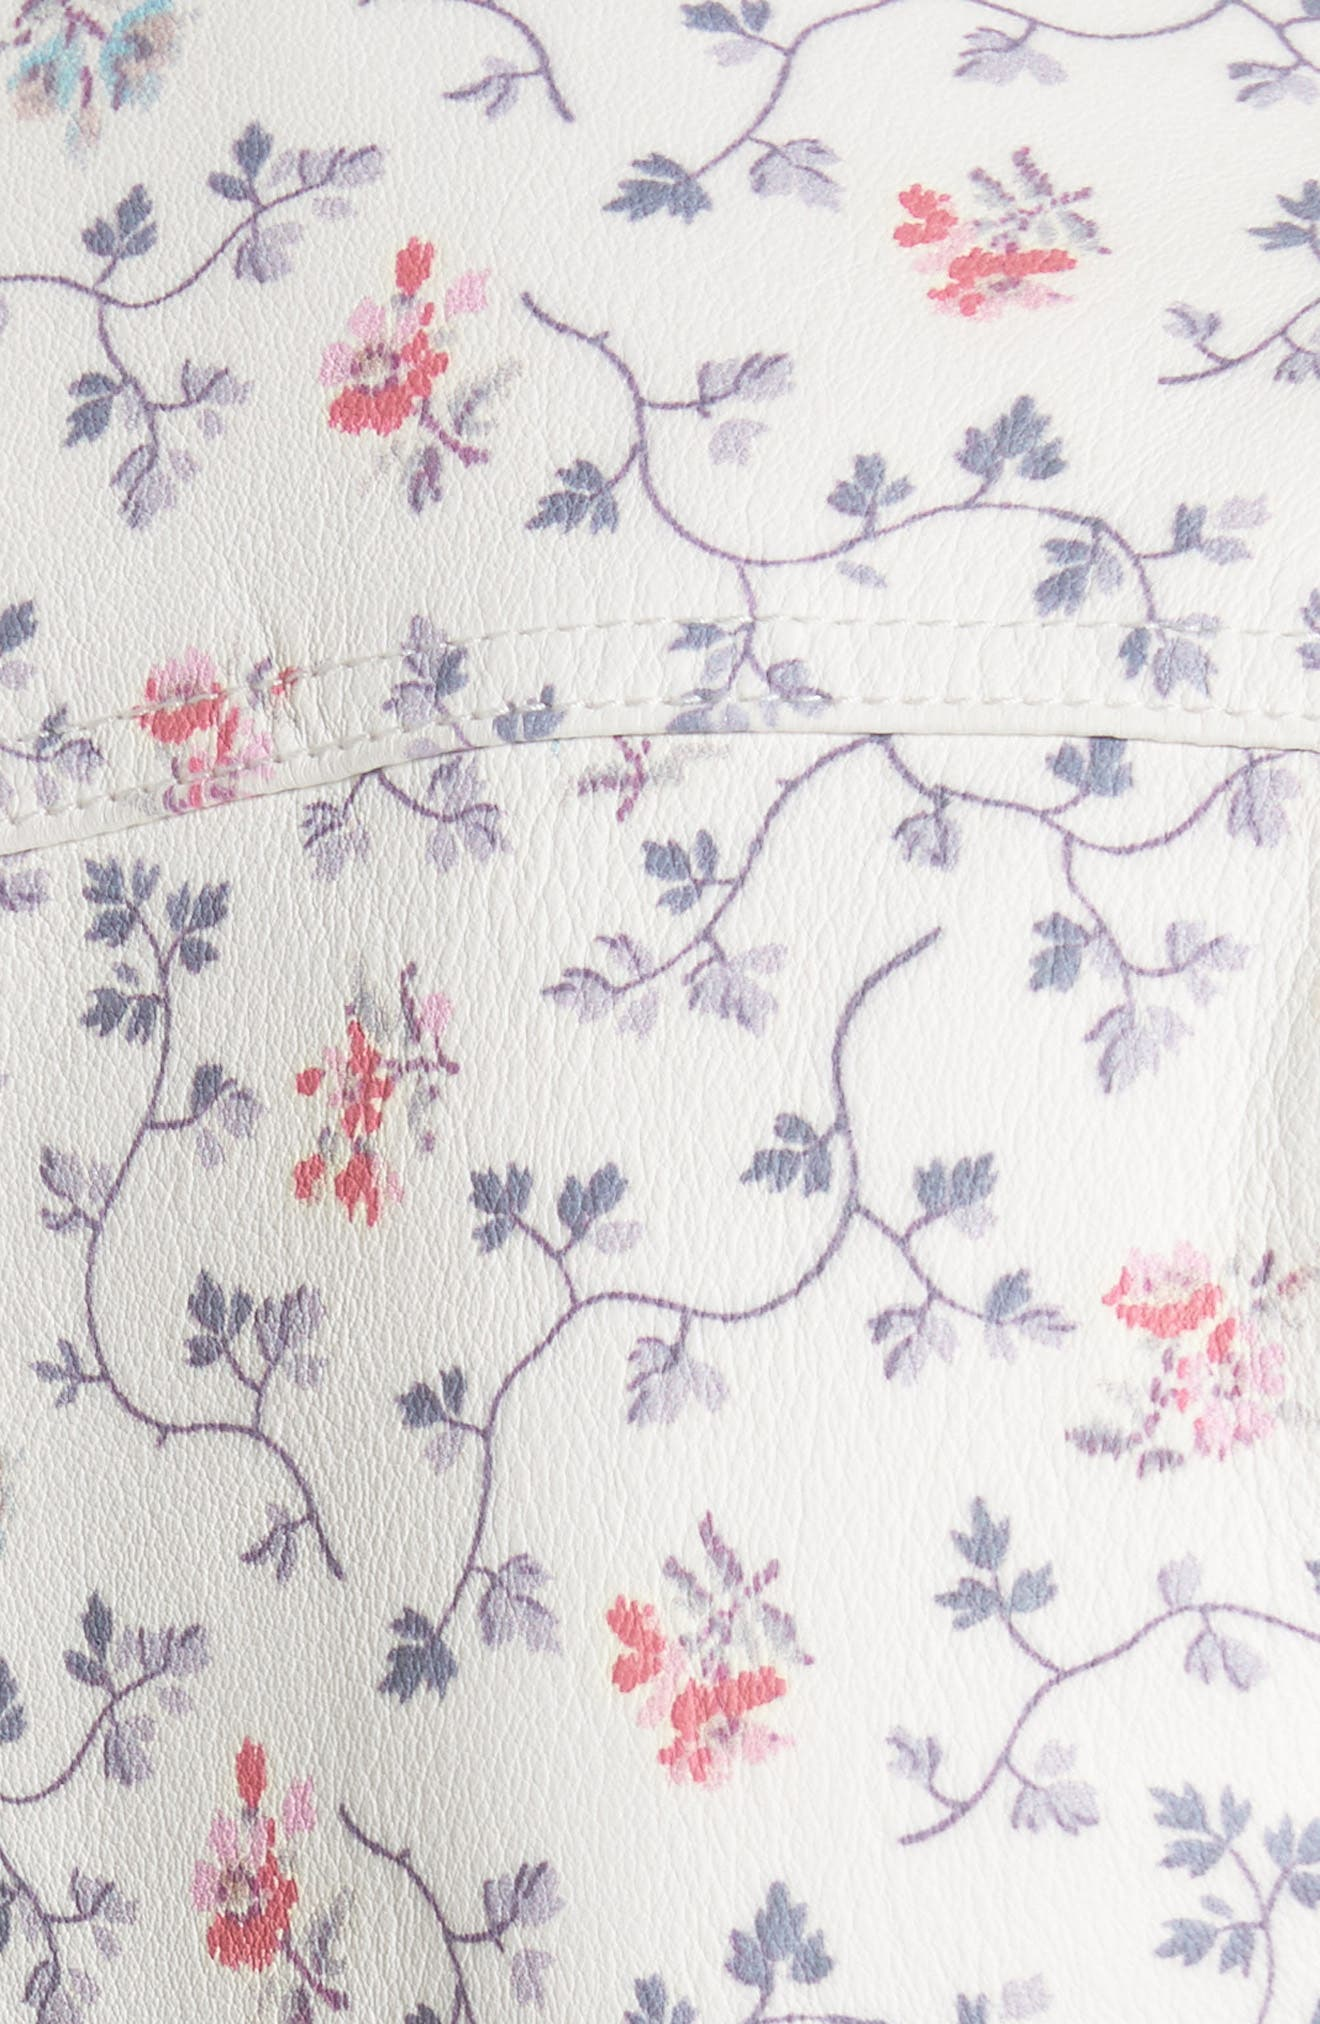 Floral Vine Leather Jacket,                             Alternate thumbnail 6, color,                             909